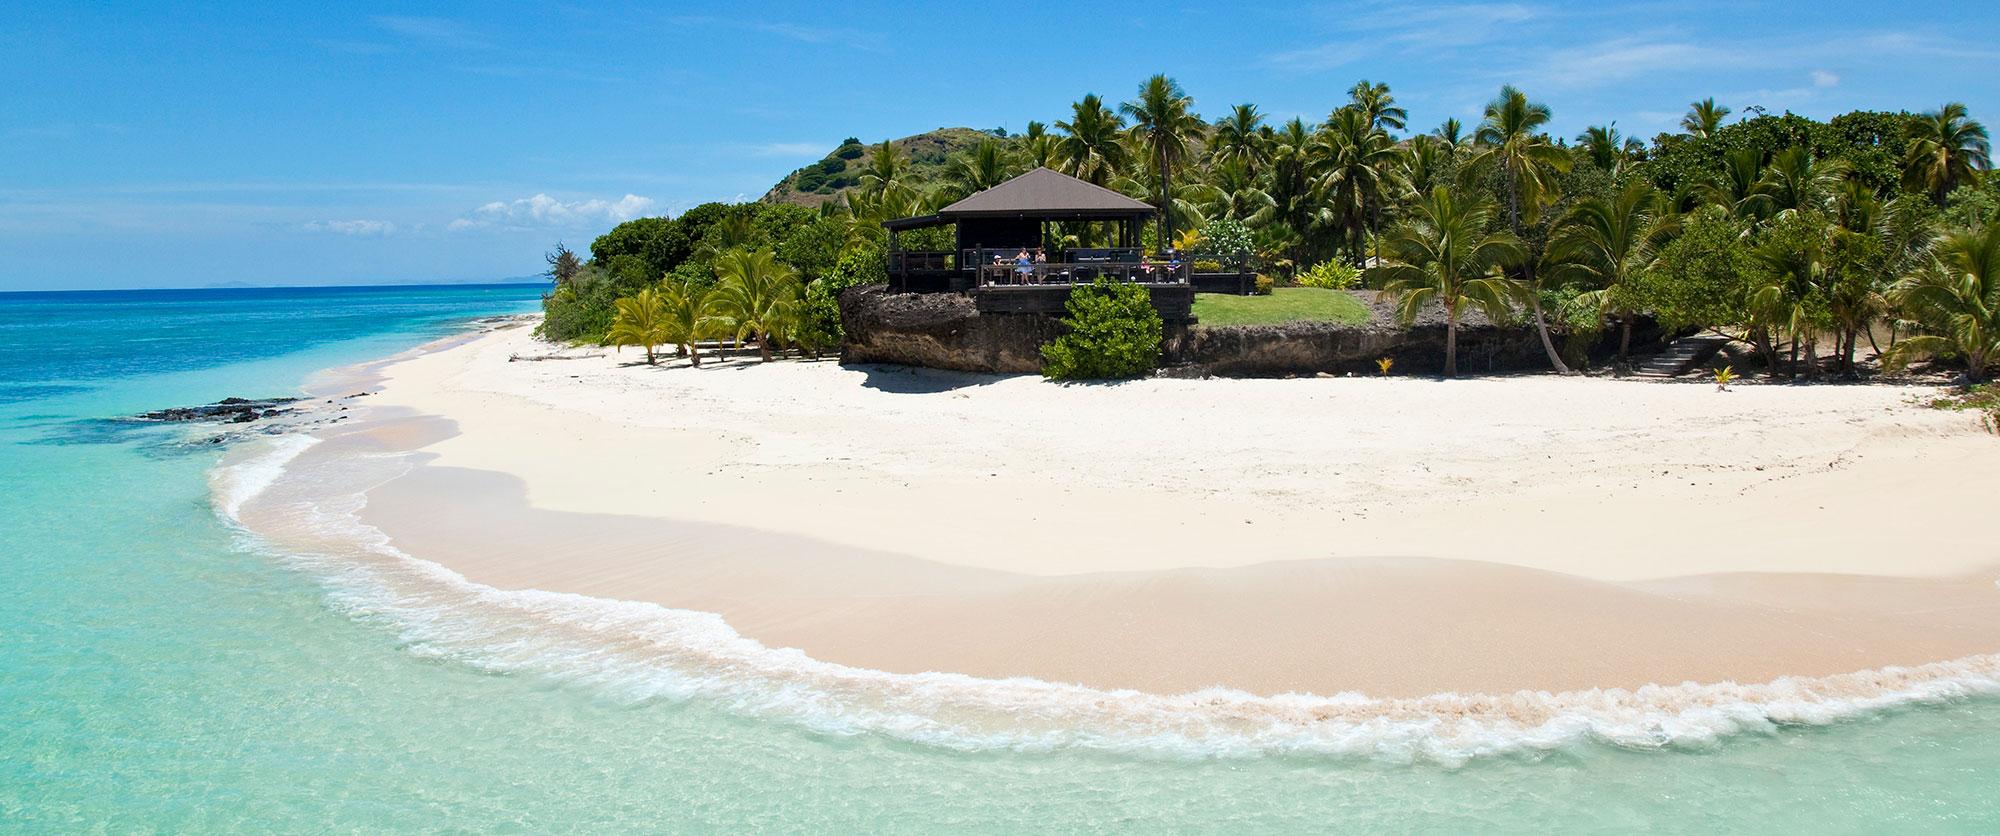 Destination Wedding: VOMO Island Fiji